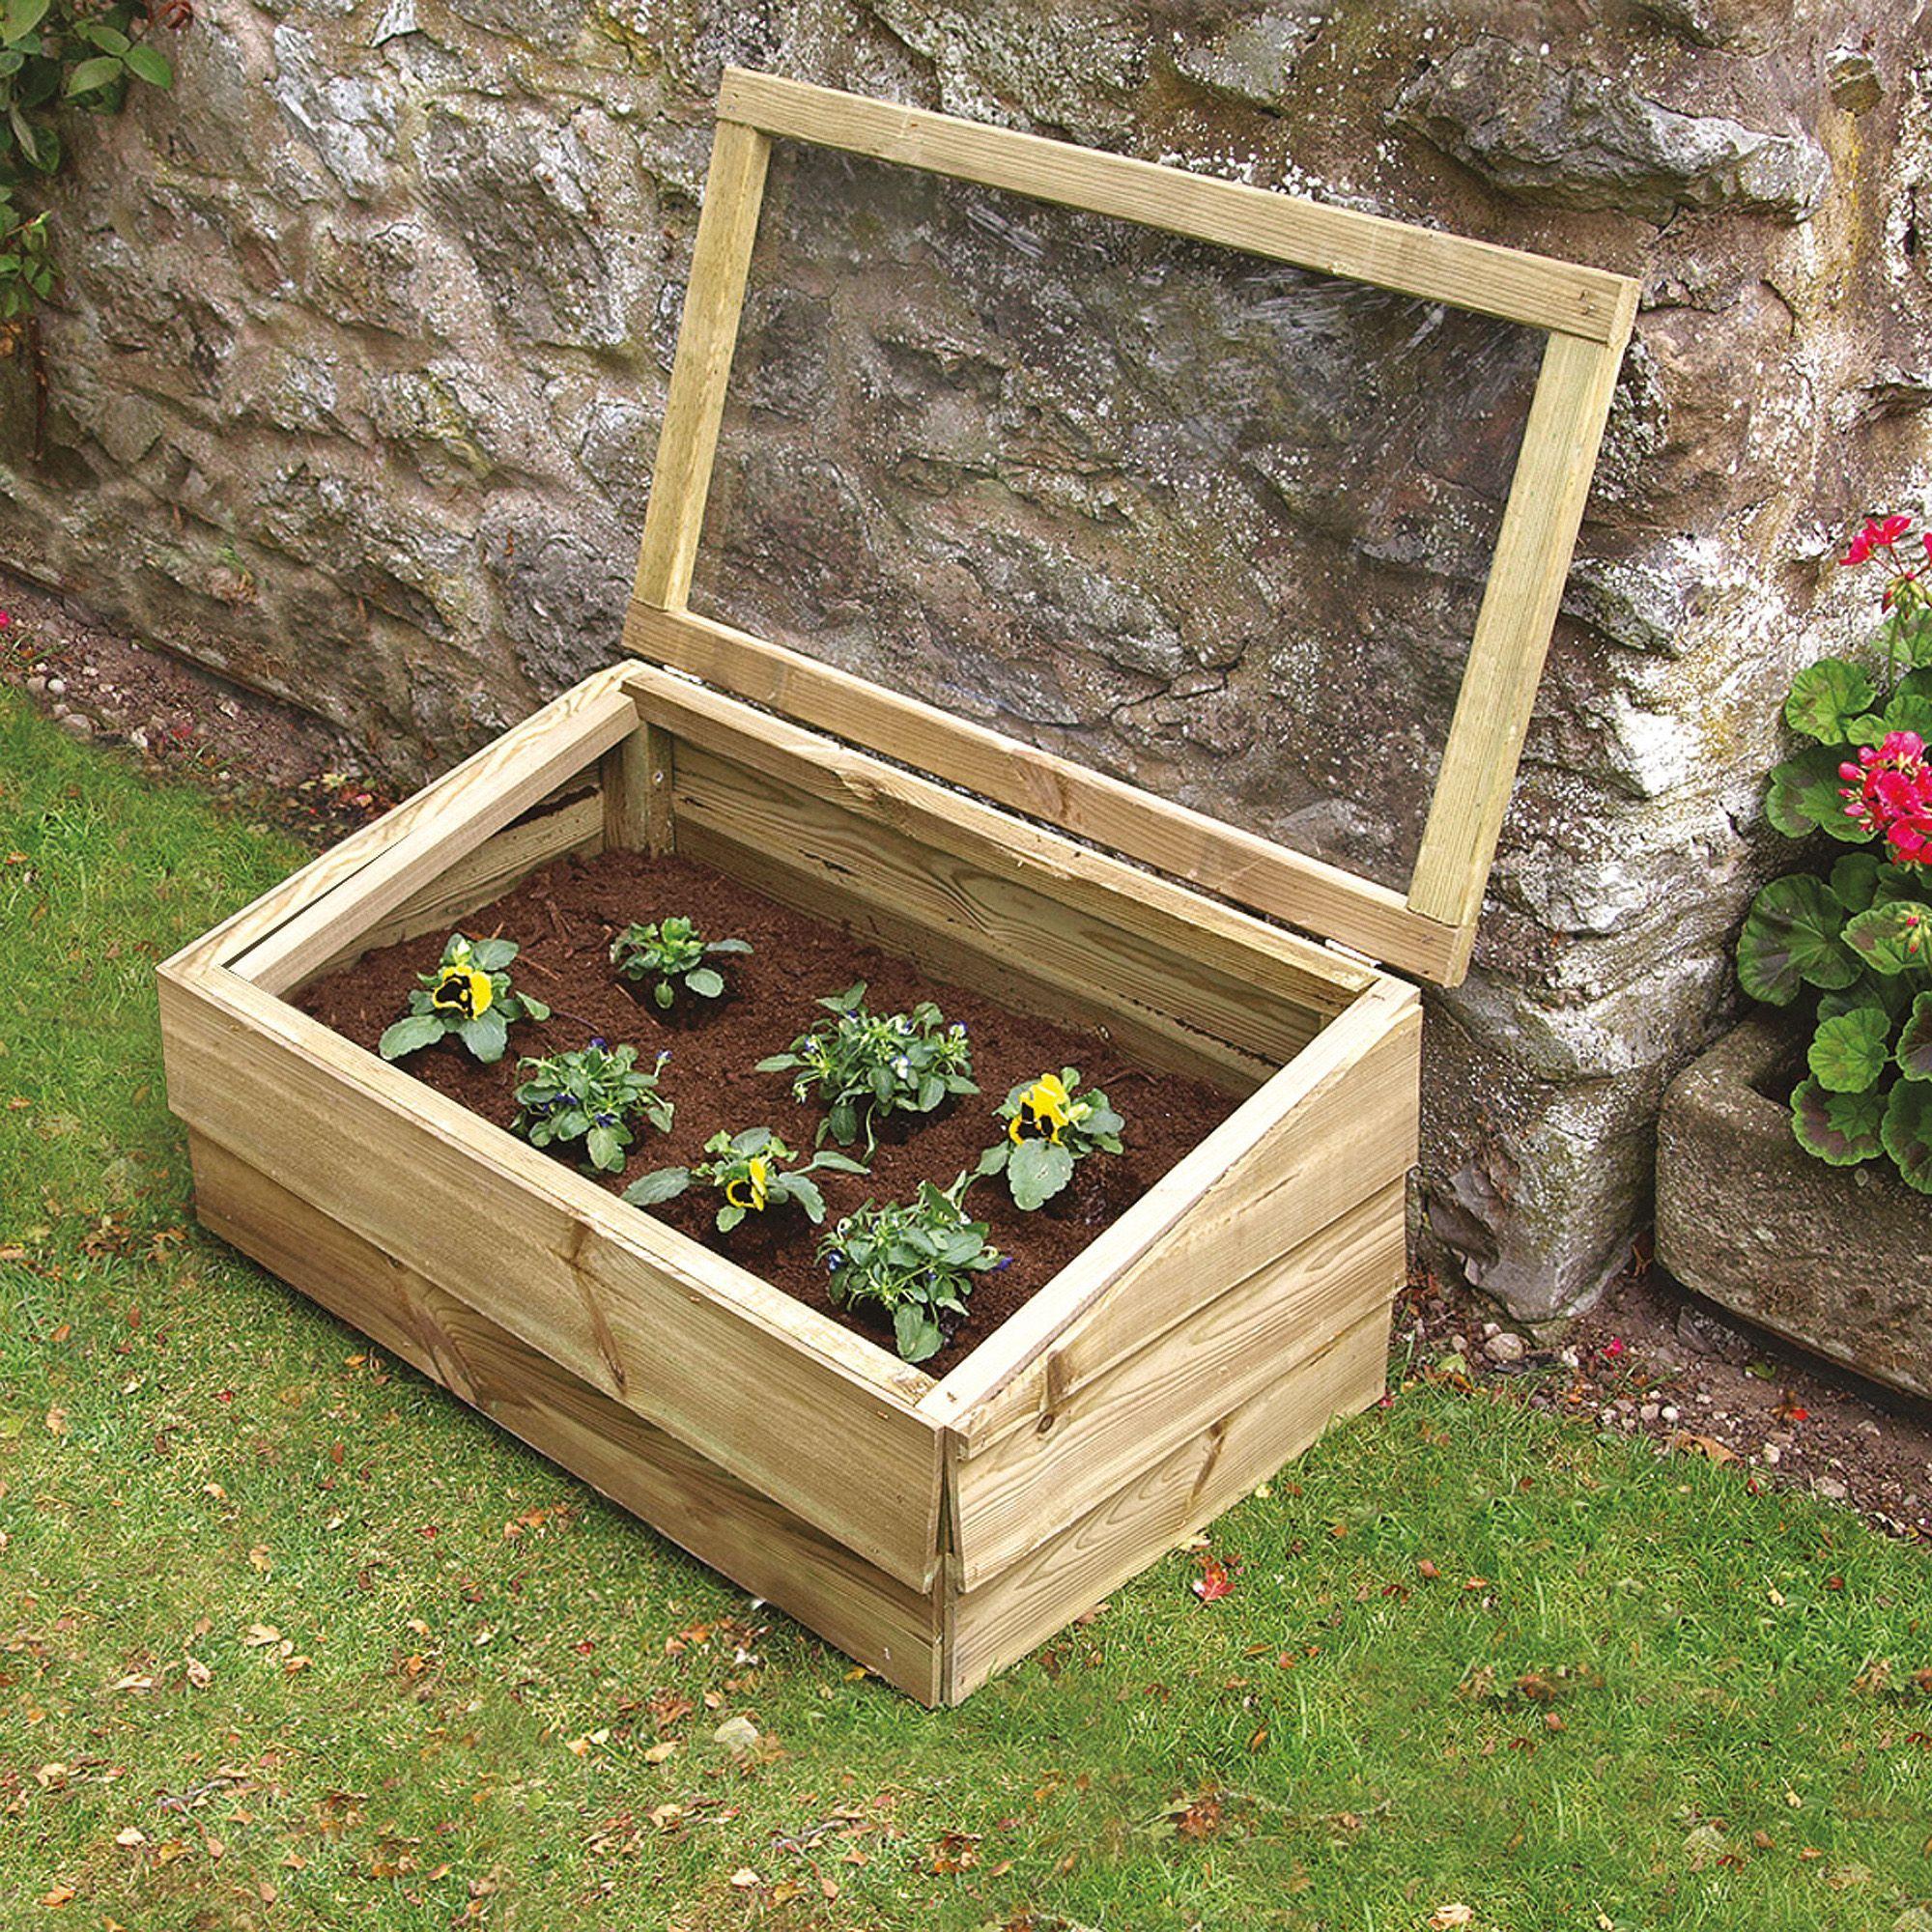 Grange Wooden Cold Frame | Cold frame, Garden ideas and Gardens